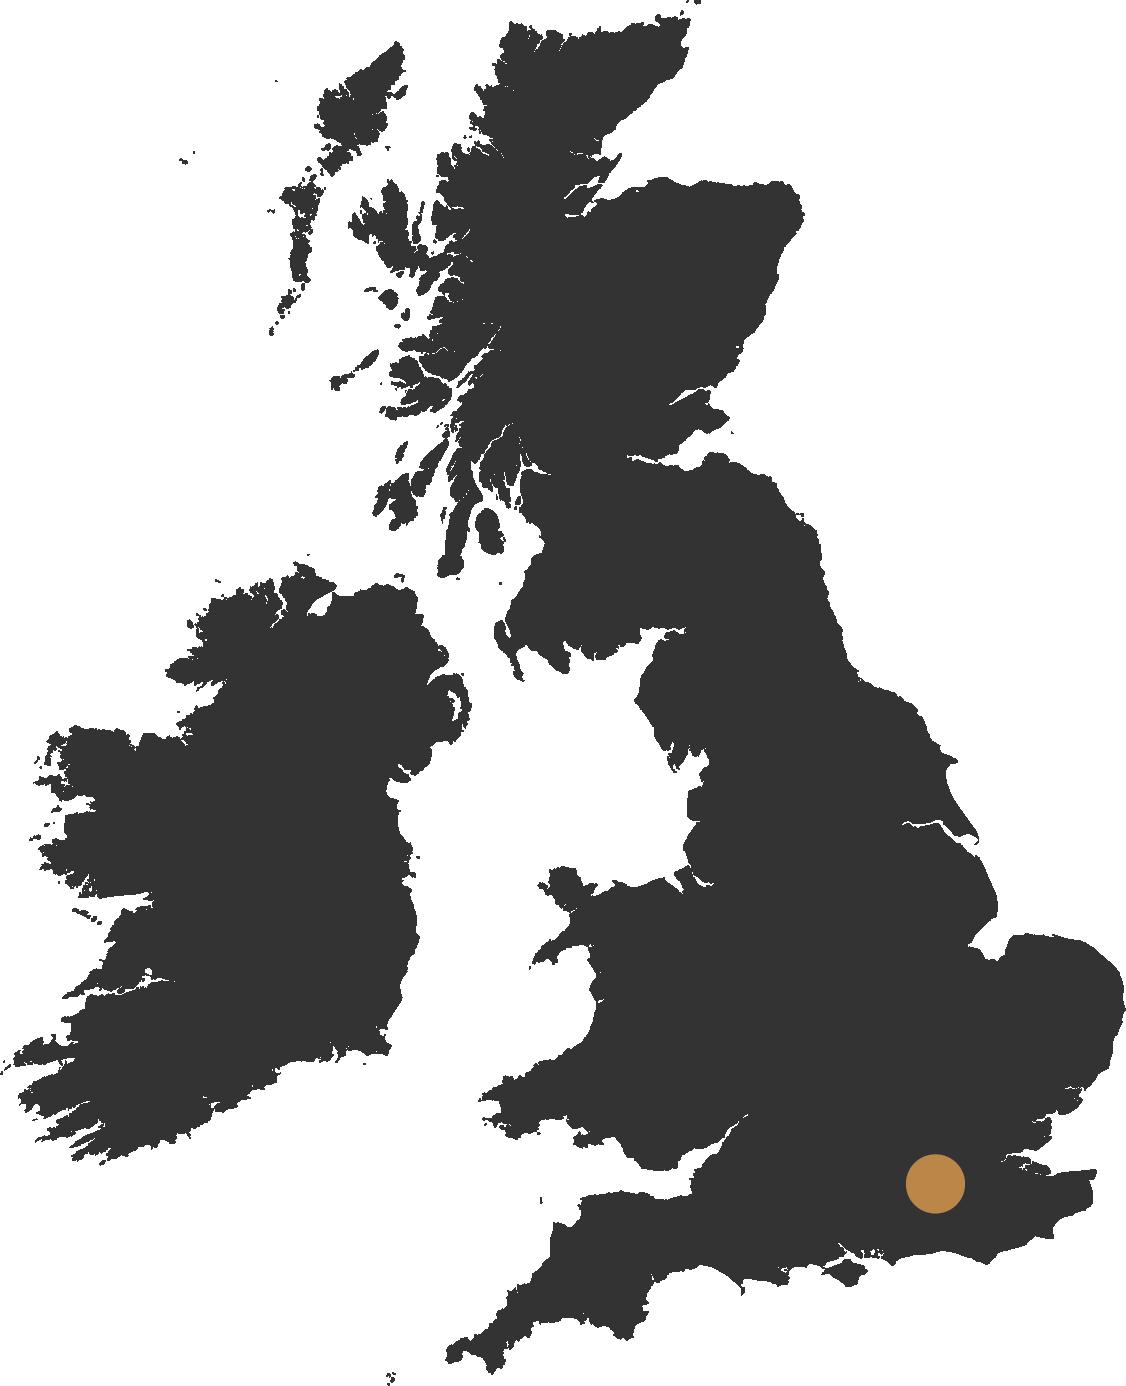 leatherhead map